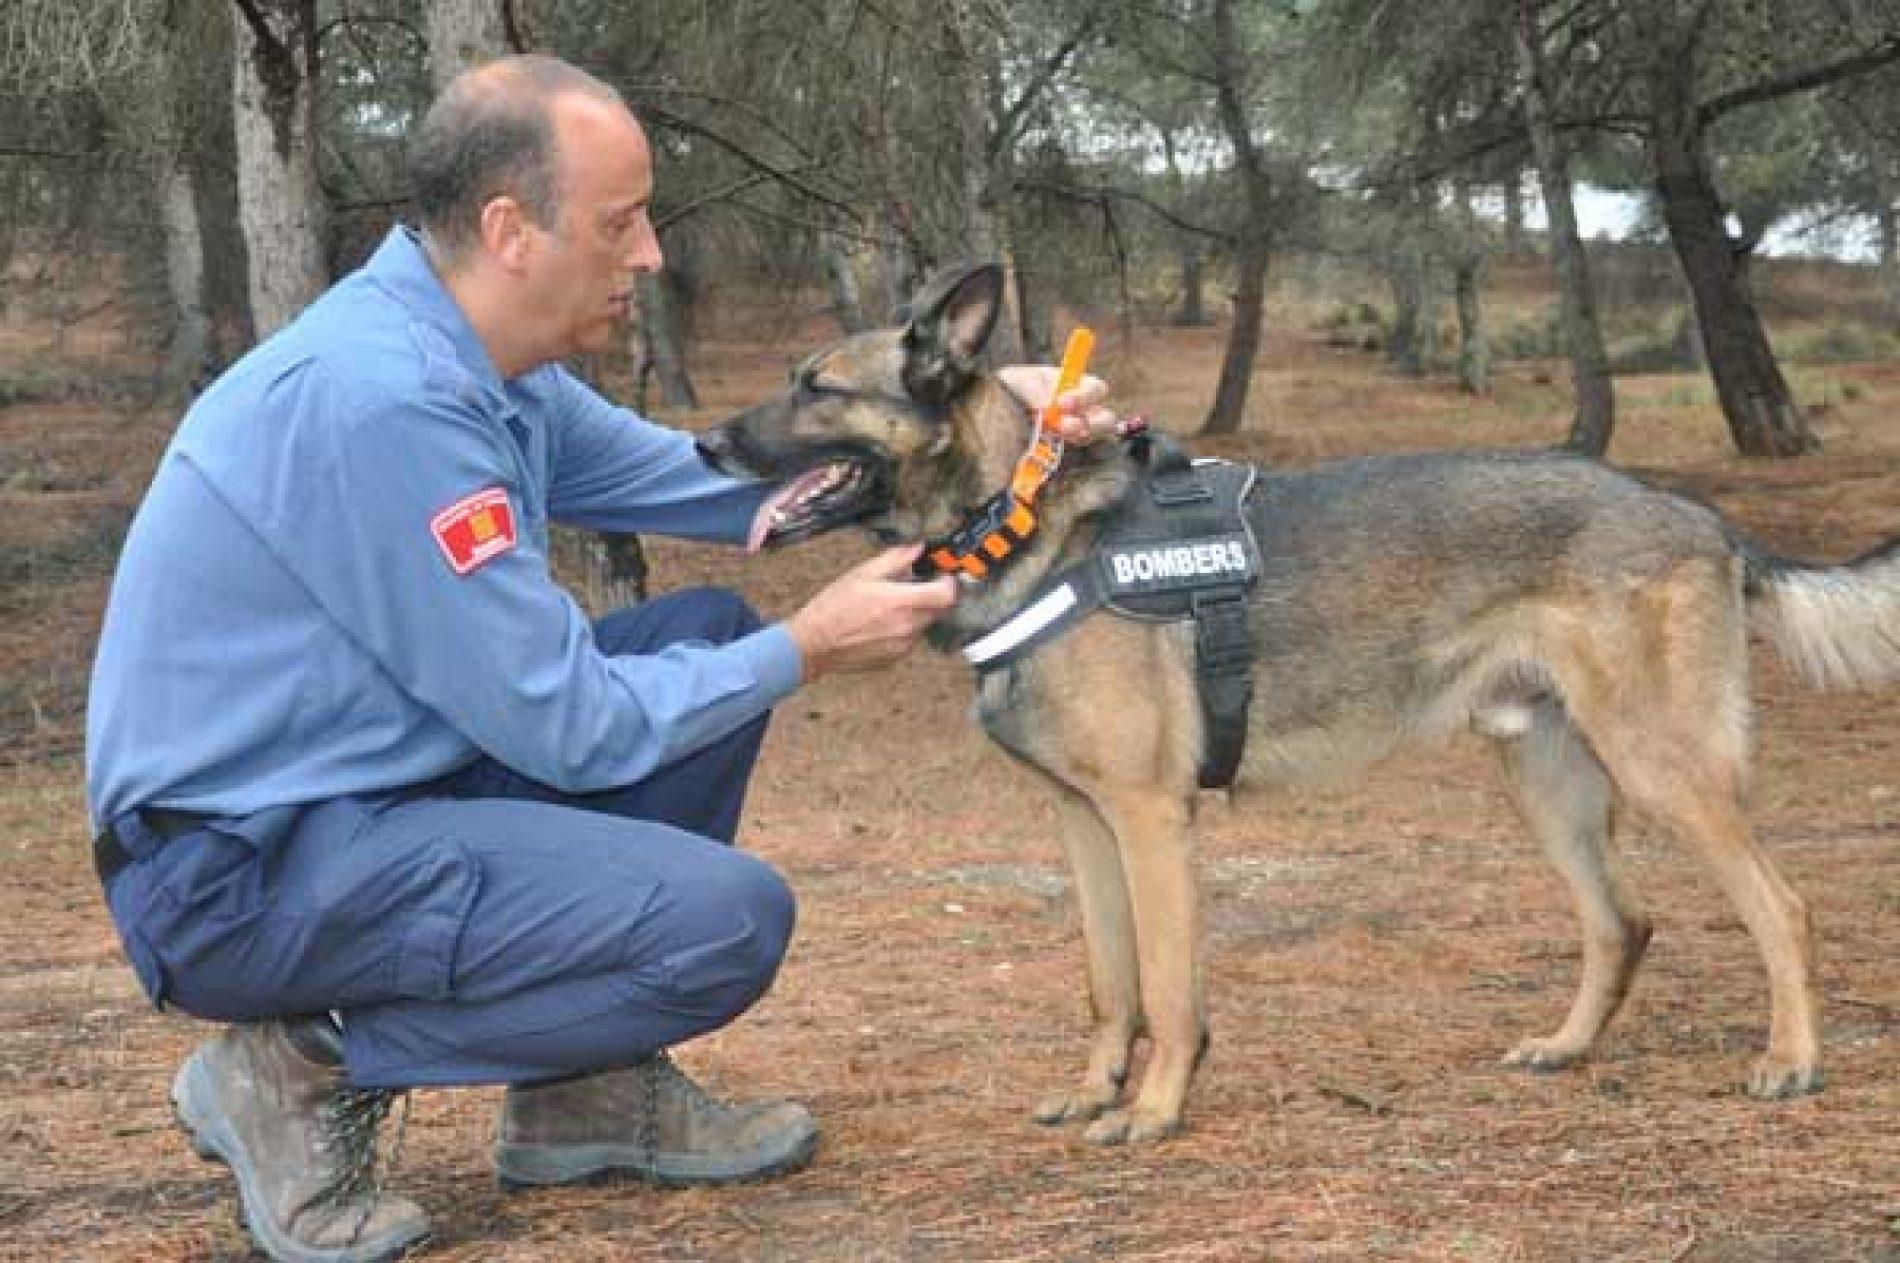 Sistema de rastreo de perros de Garmin